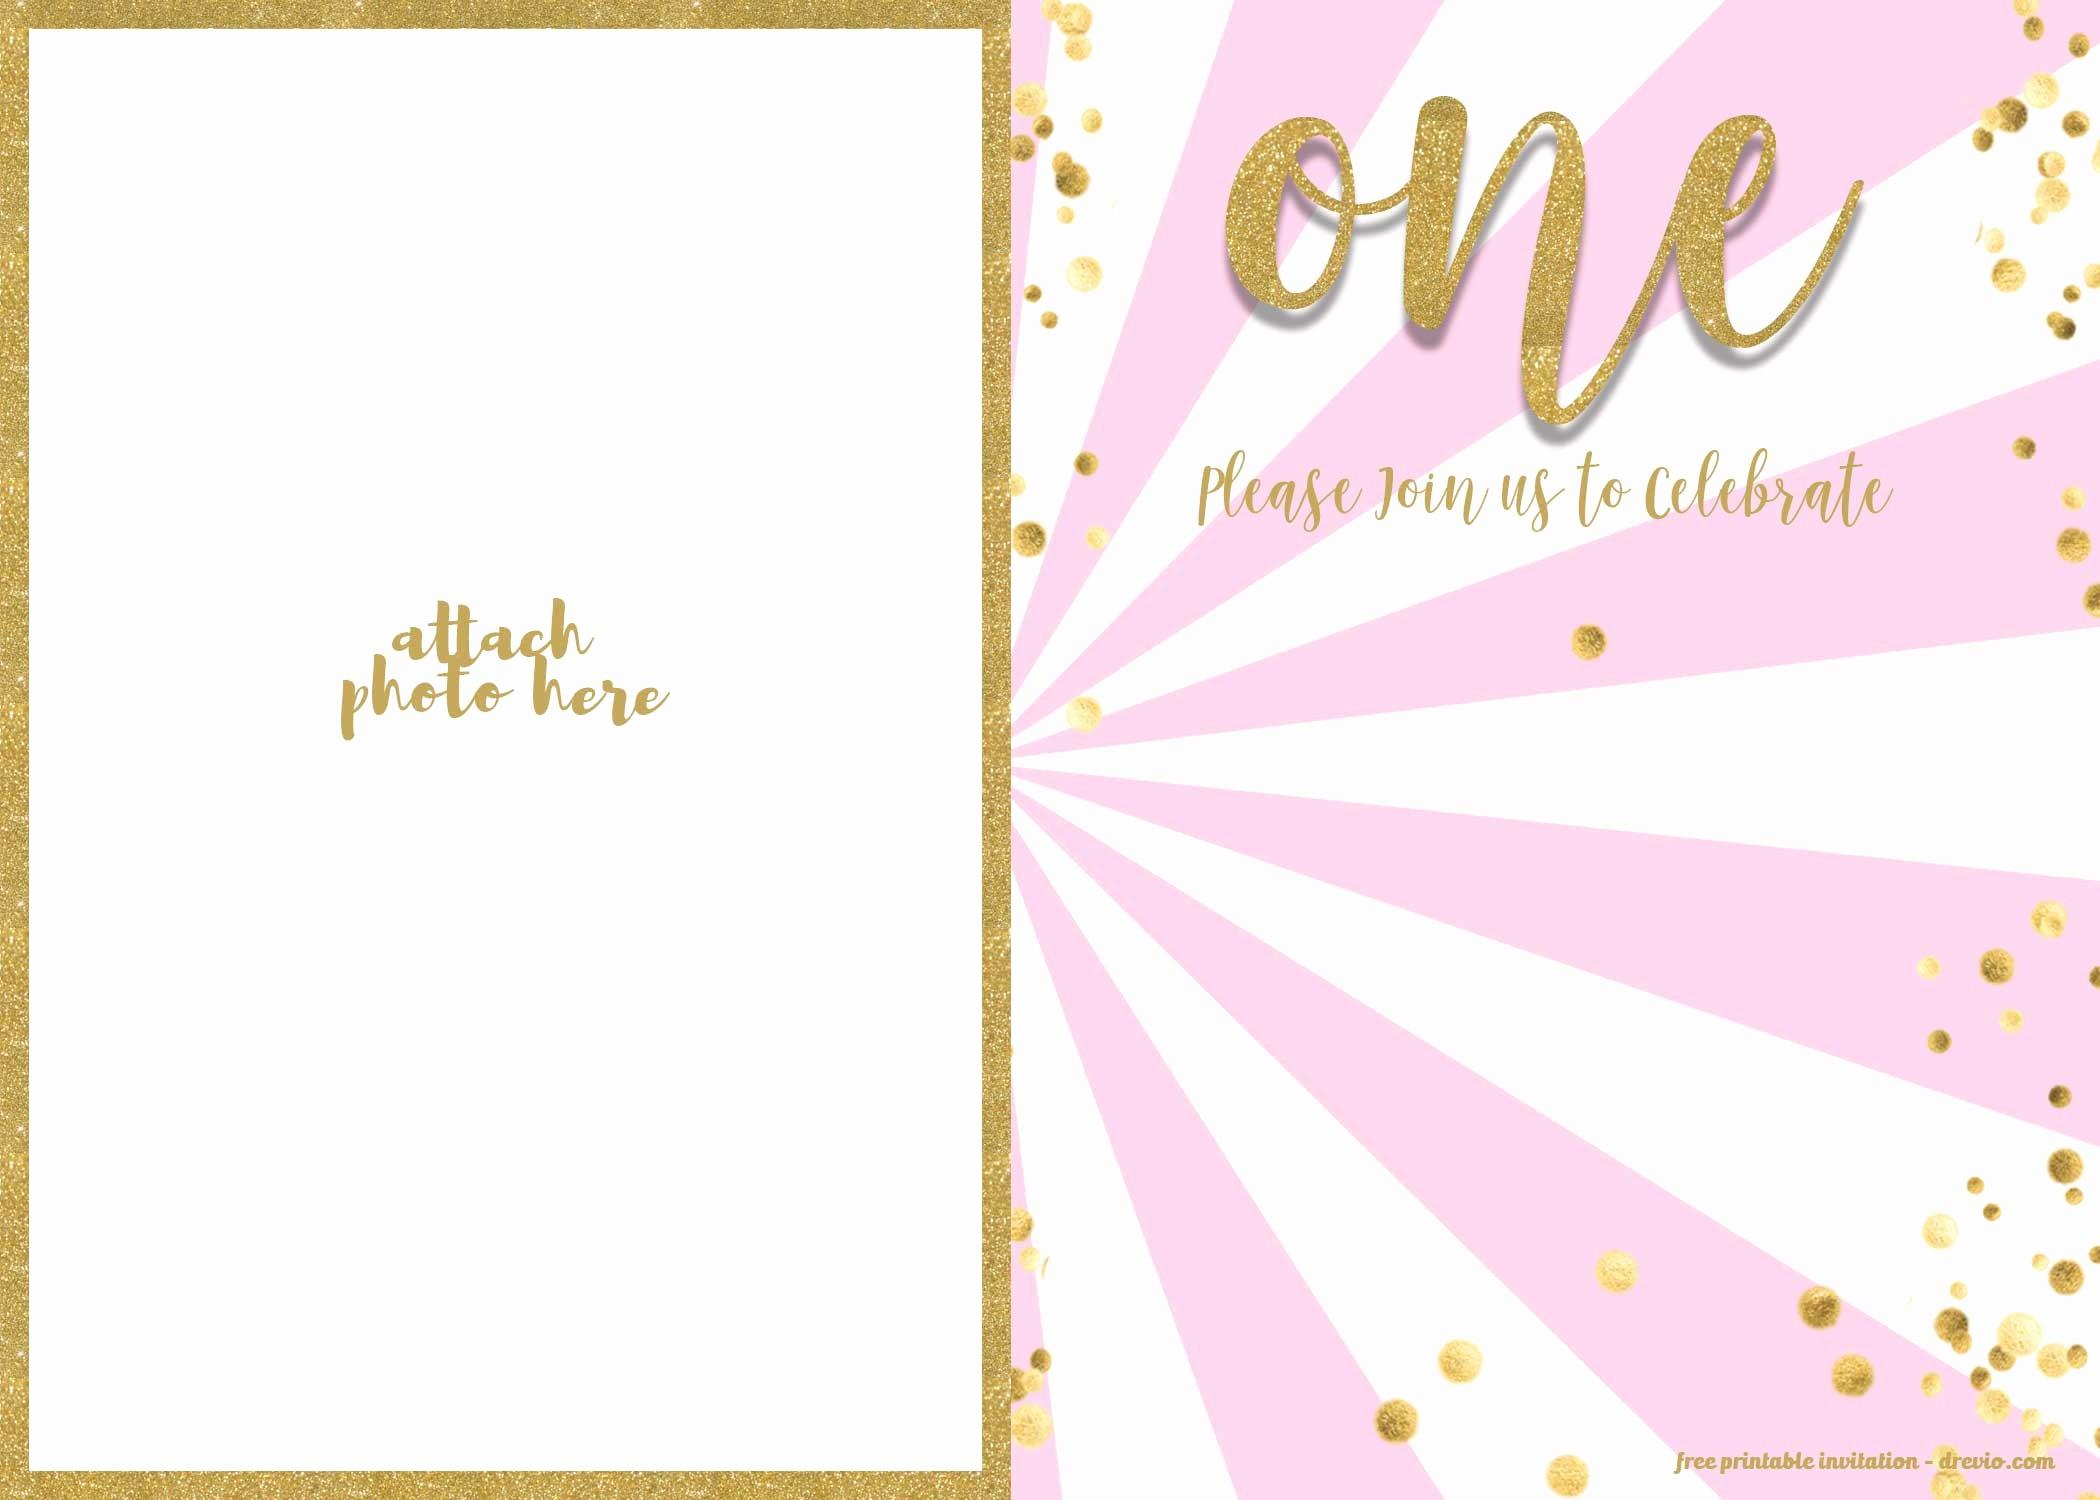 Free Templates for Birthday Invitations Awesome Free 1st Birthday Invitations Template for Girl – Free